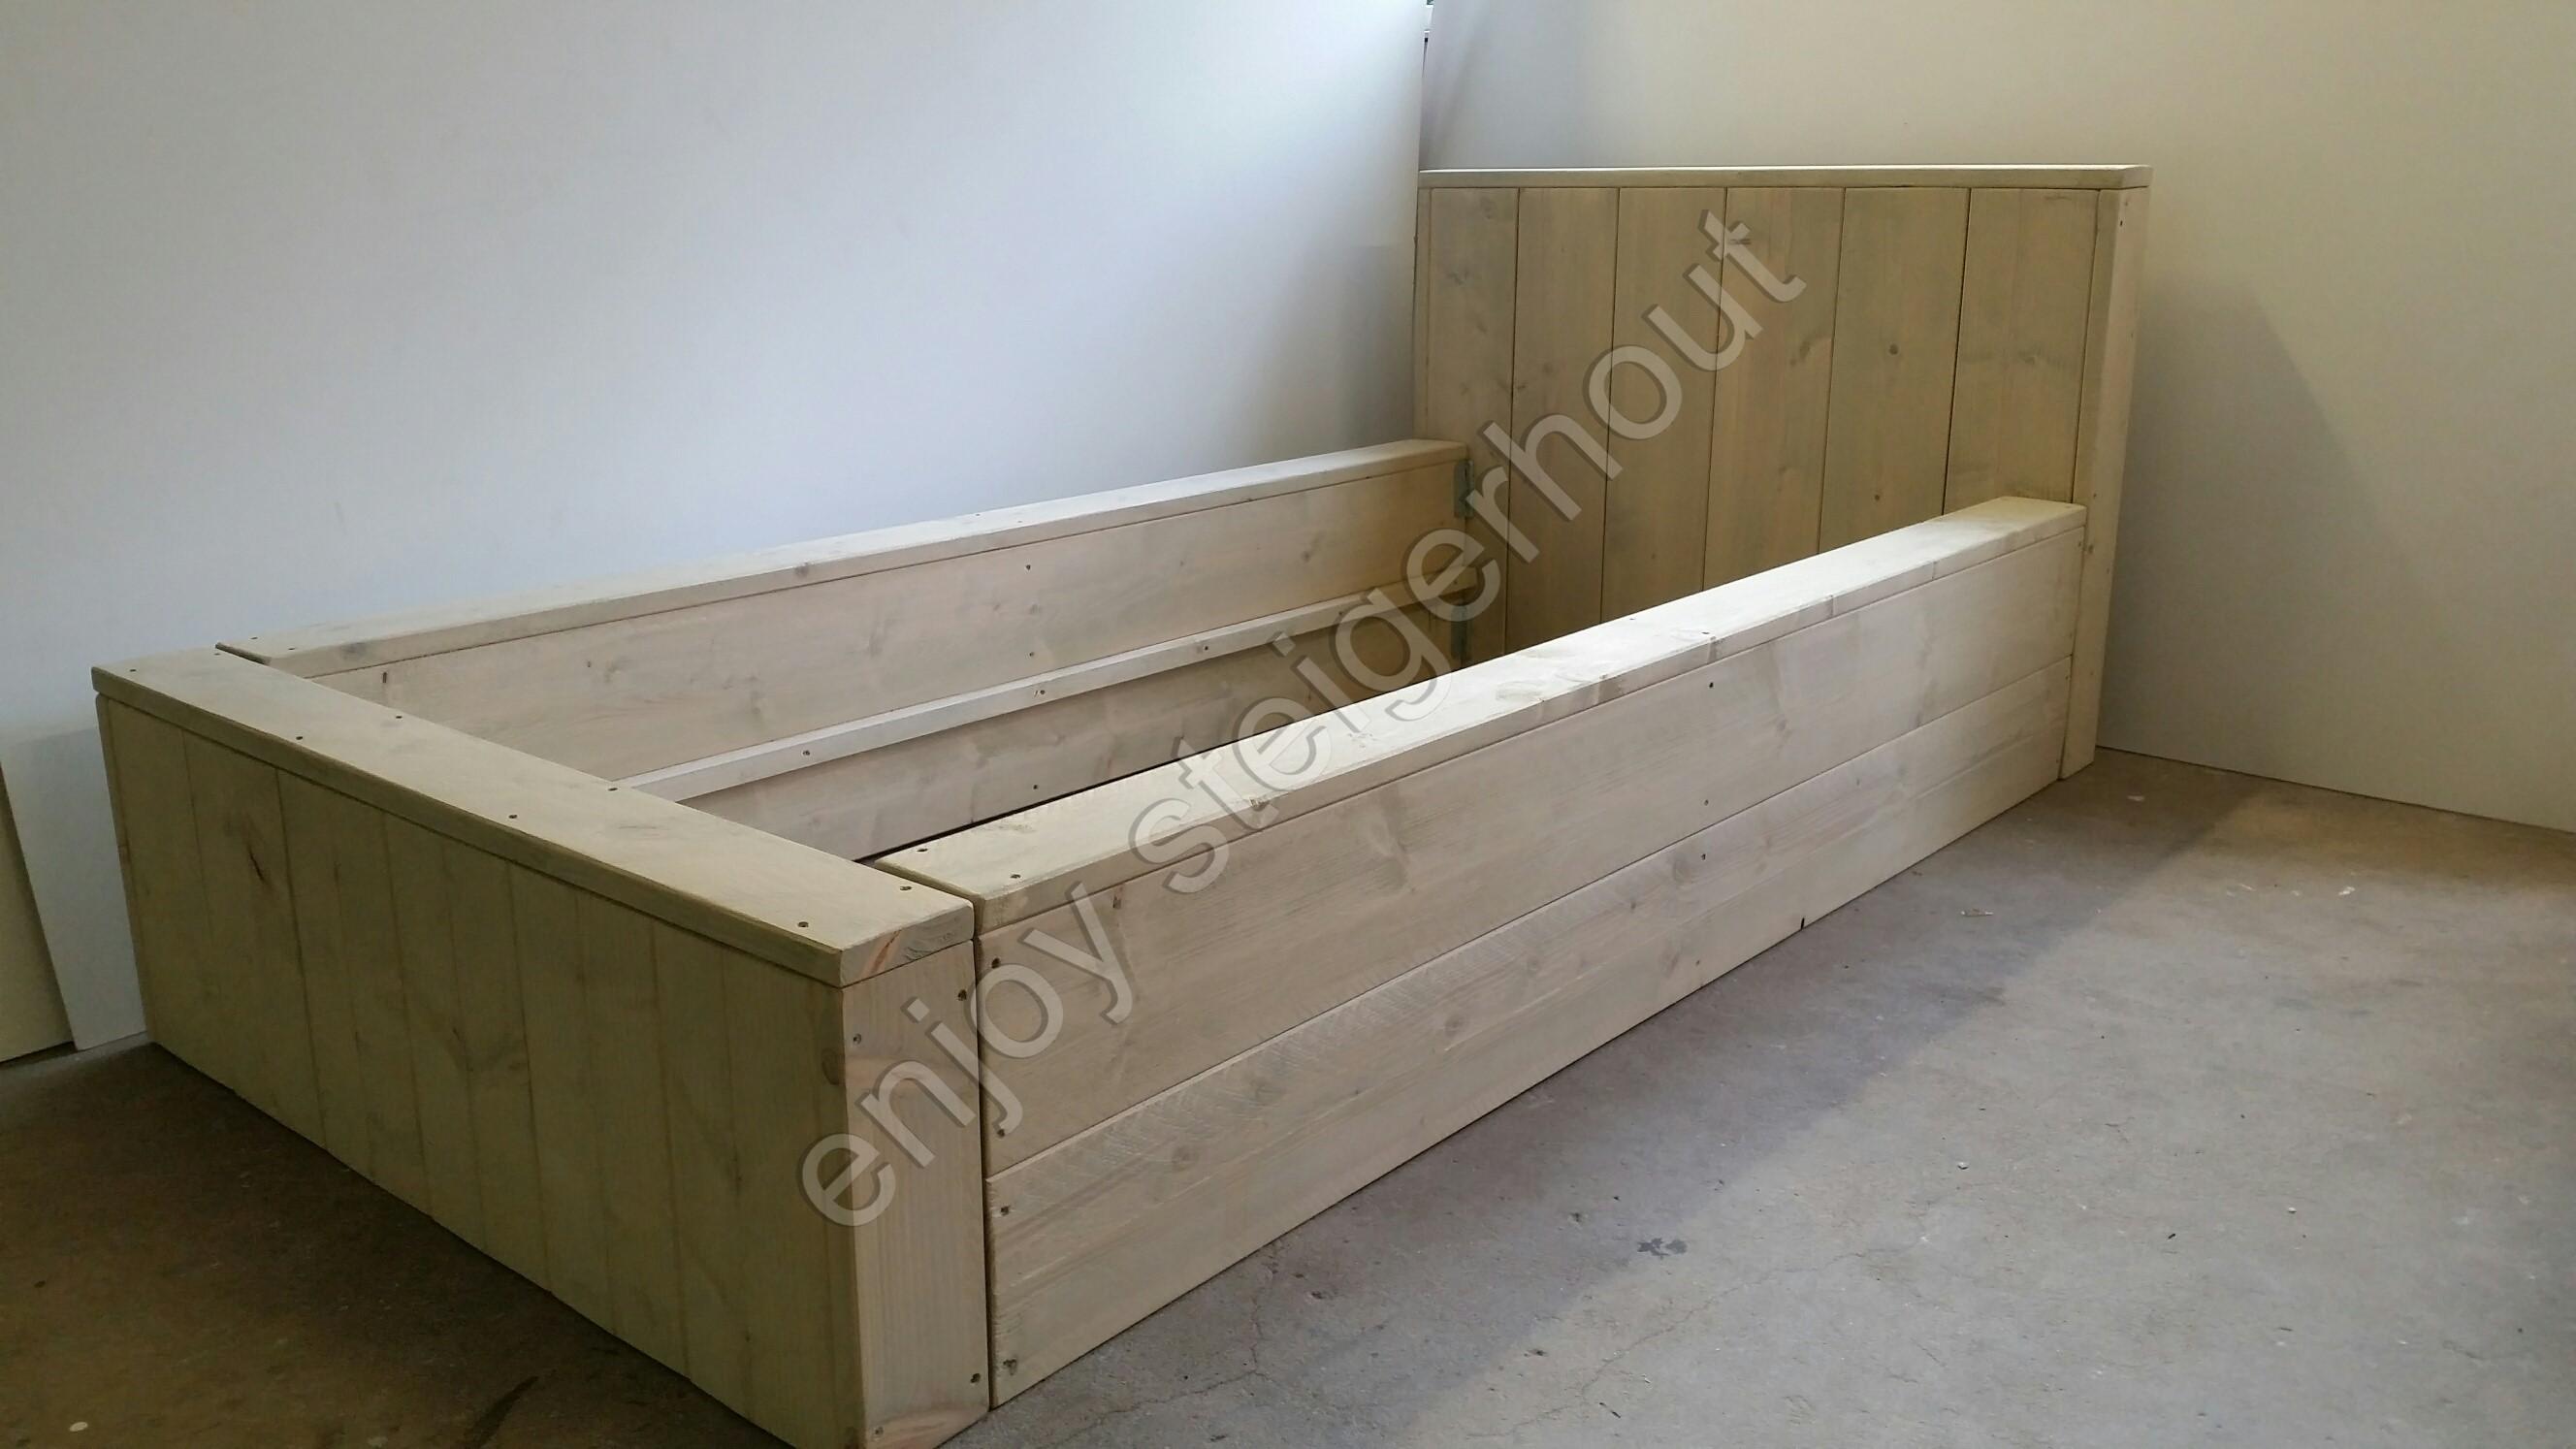 Enjoy steigerhout bed enjoy persoons enjoy steigerhout